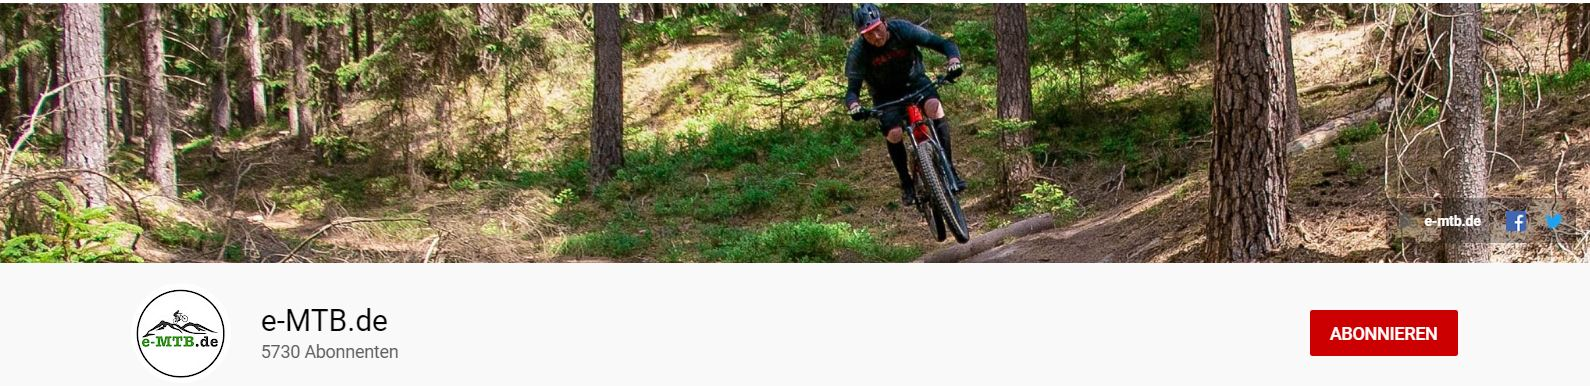 Der e-MTB.de Youtube Kanal mit allen e-Mountainbike Testfahrten